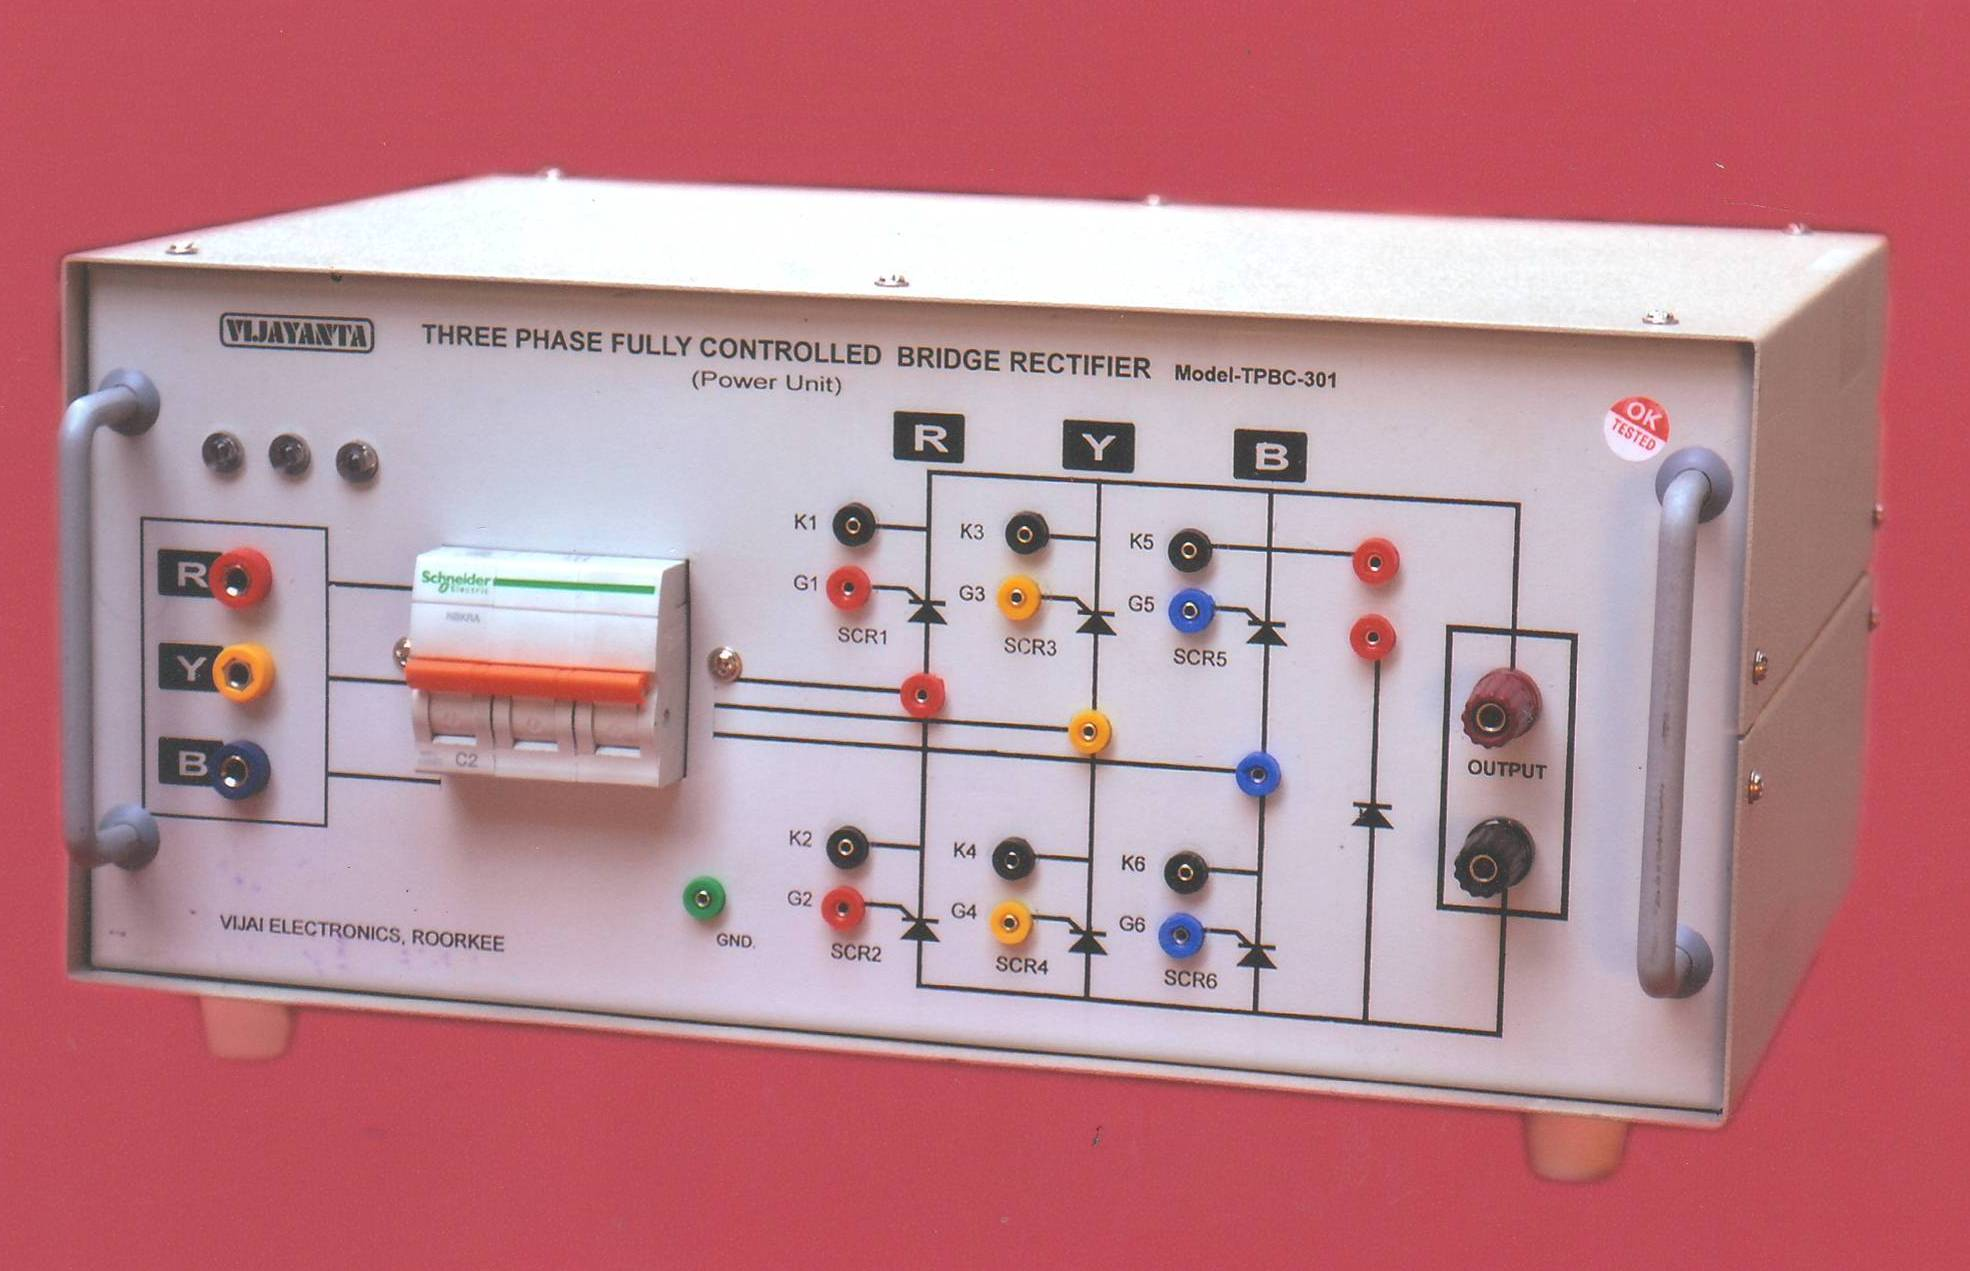 Vijayanta Roorkeeuttarakhand Operation Of A 3phase Fullycontrolled Rectifier Three Phase Full Half Controlled Bridge Model Tpbc 301hf